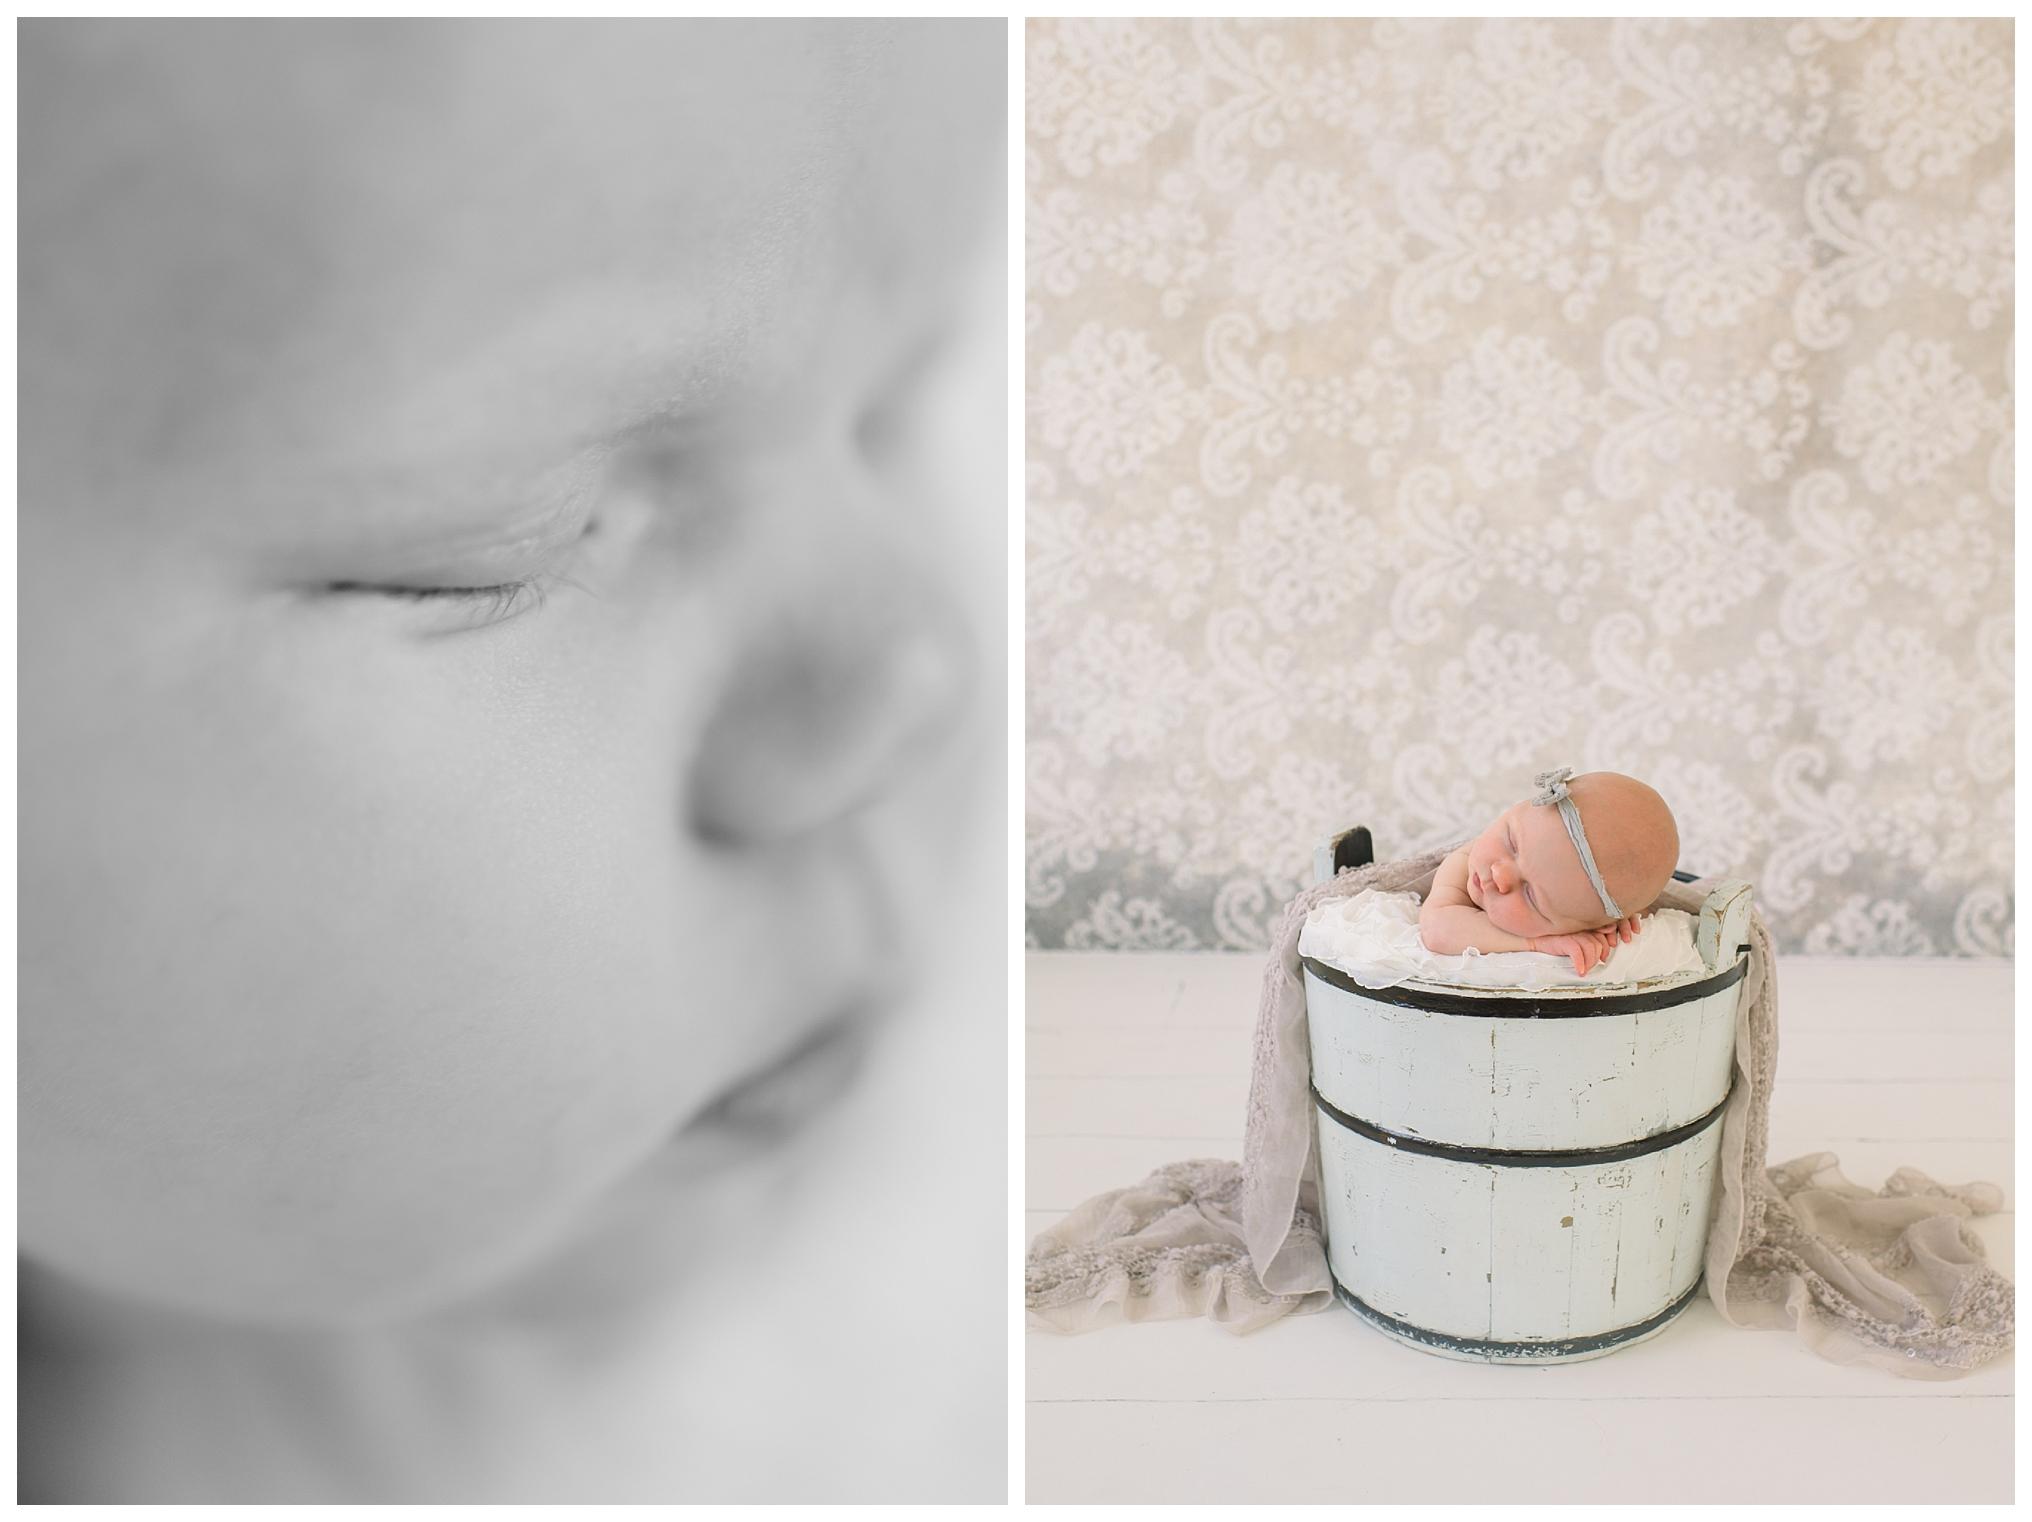 Maine-newborn-photographer-sweet-light-portraits269.jpg